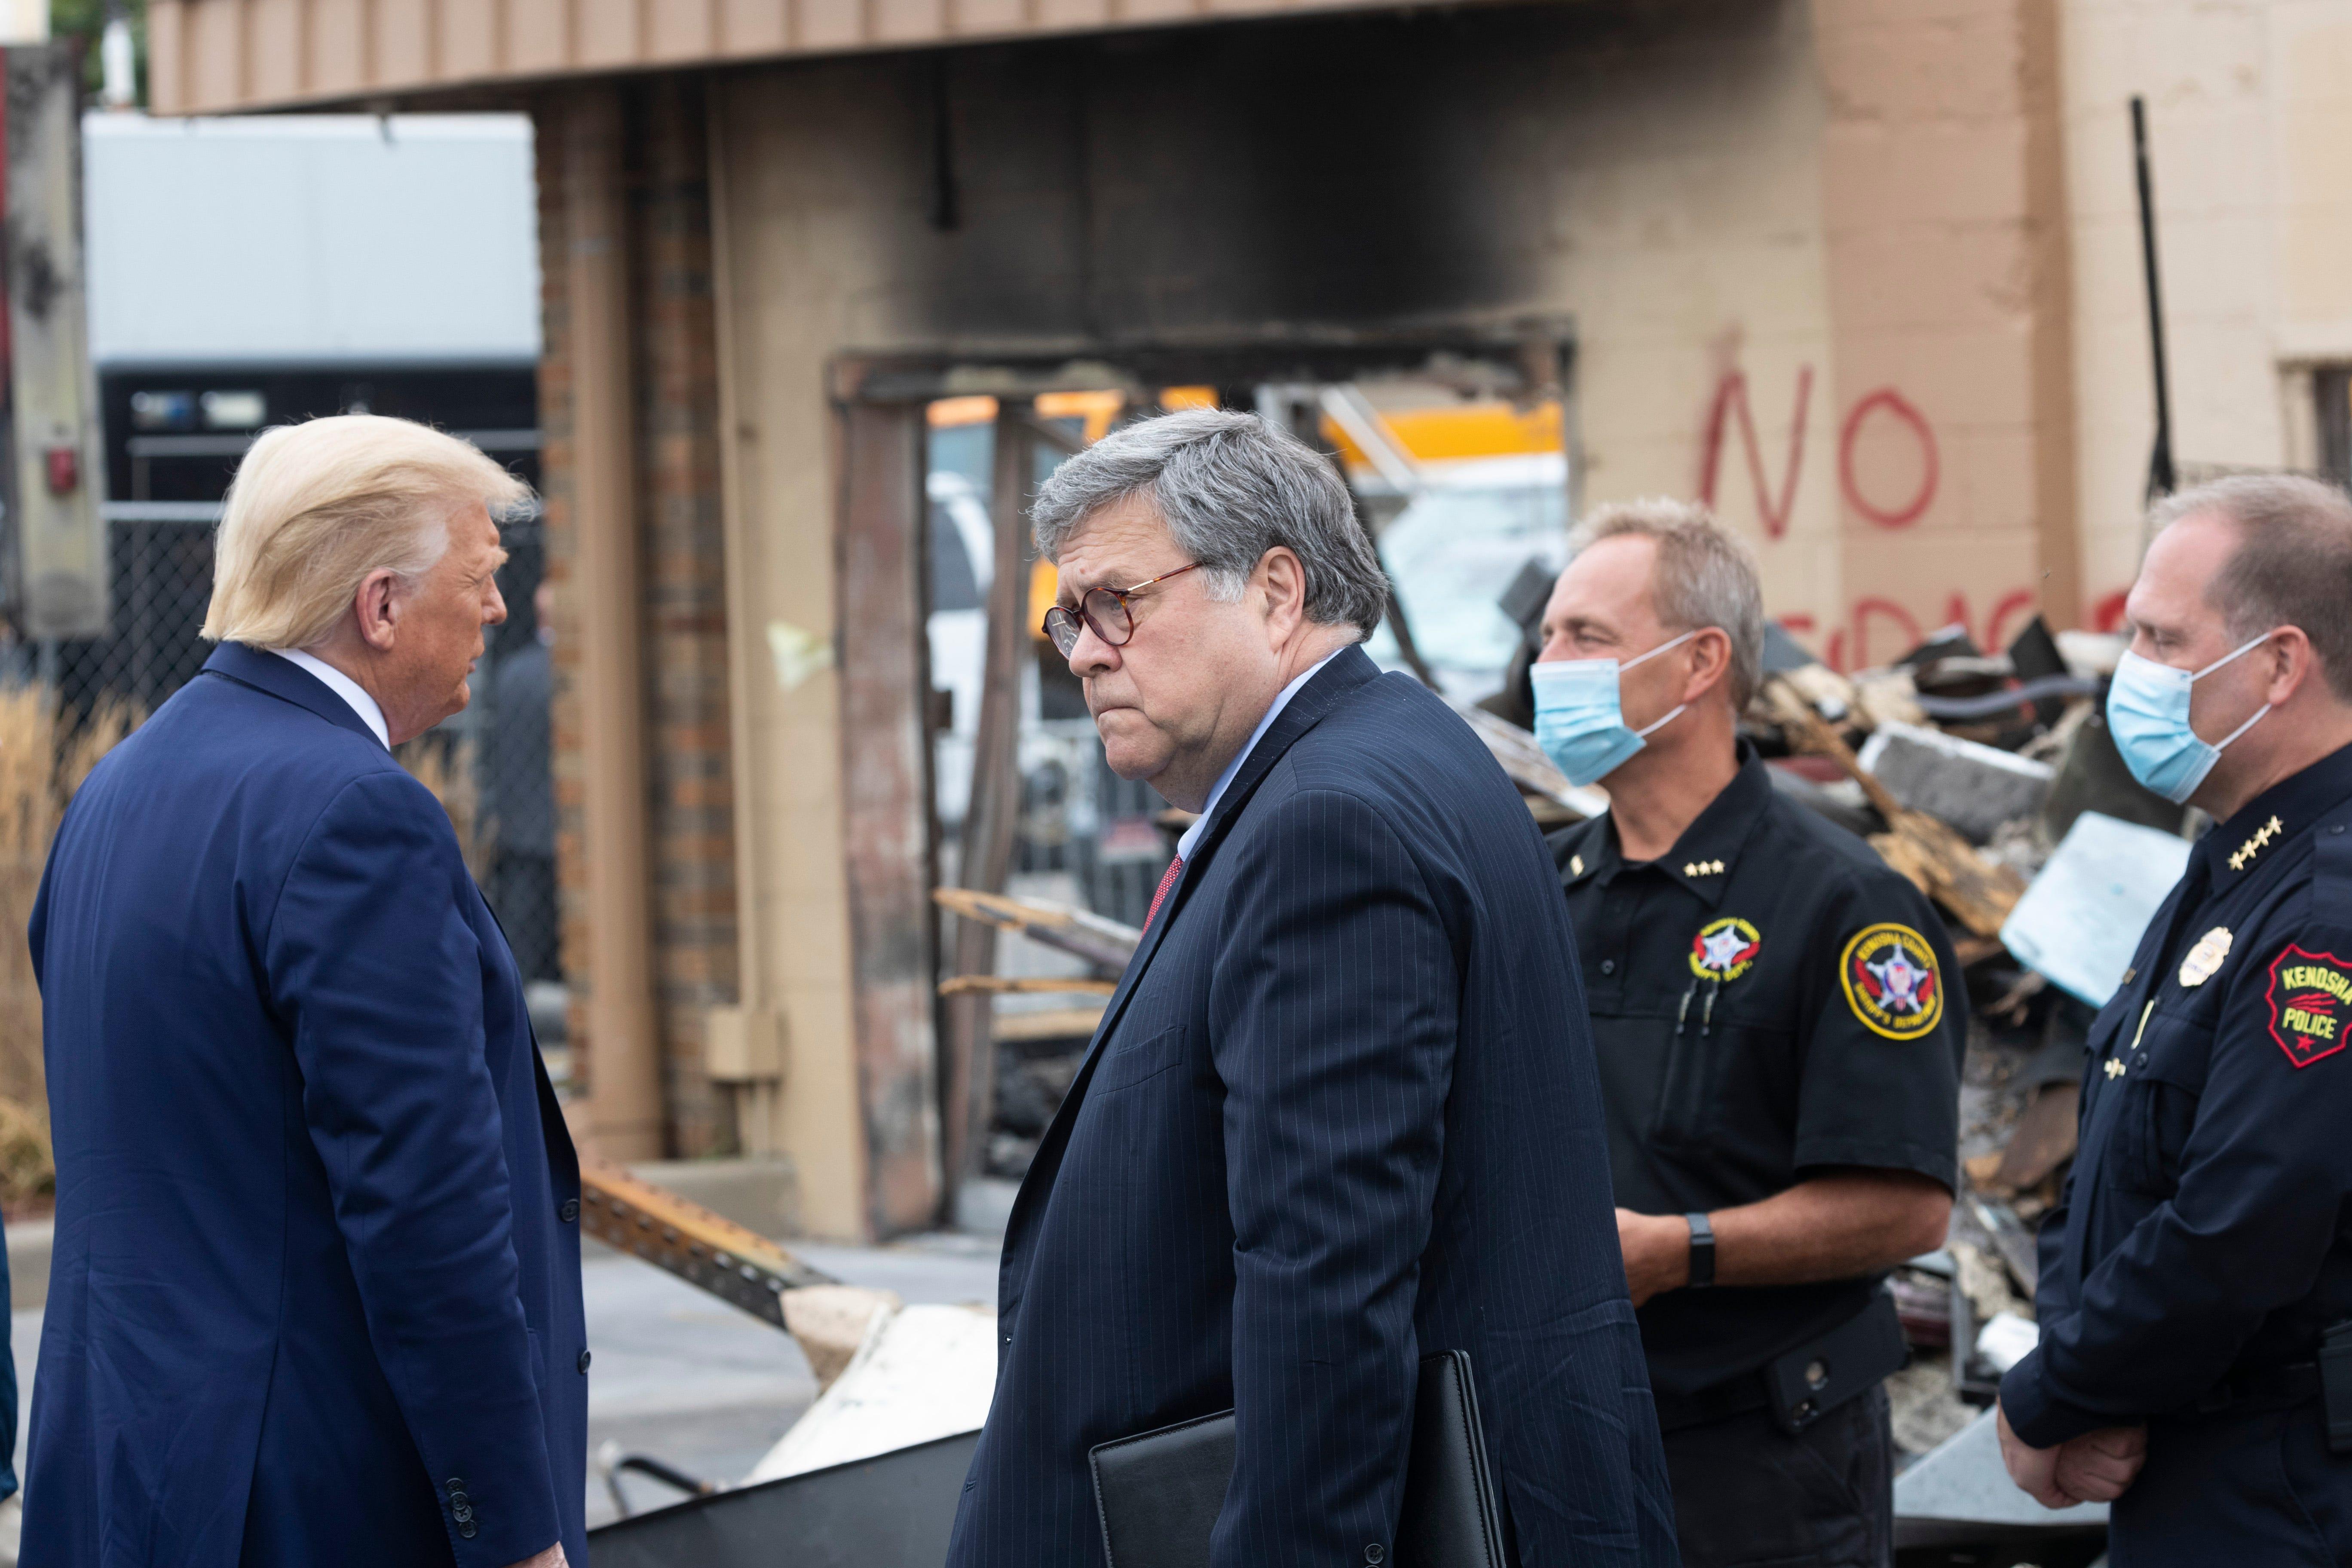 Trump s unrestrained full partner? Attorney General William Barr echoes president in slamming DOJ